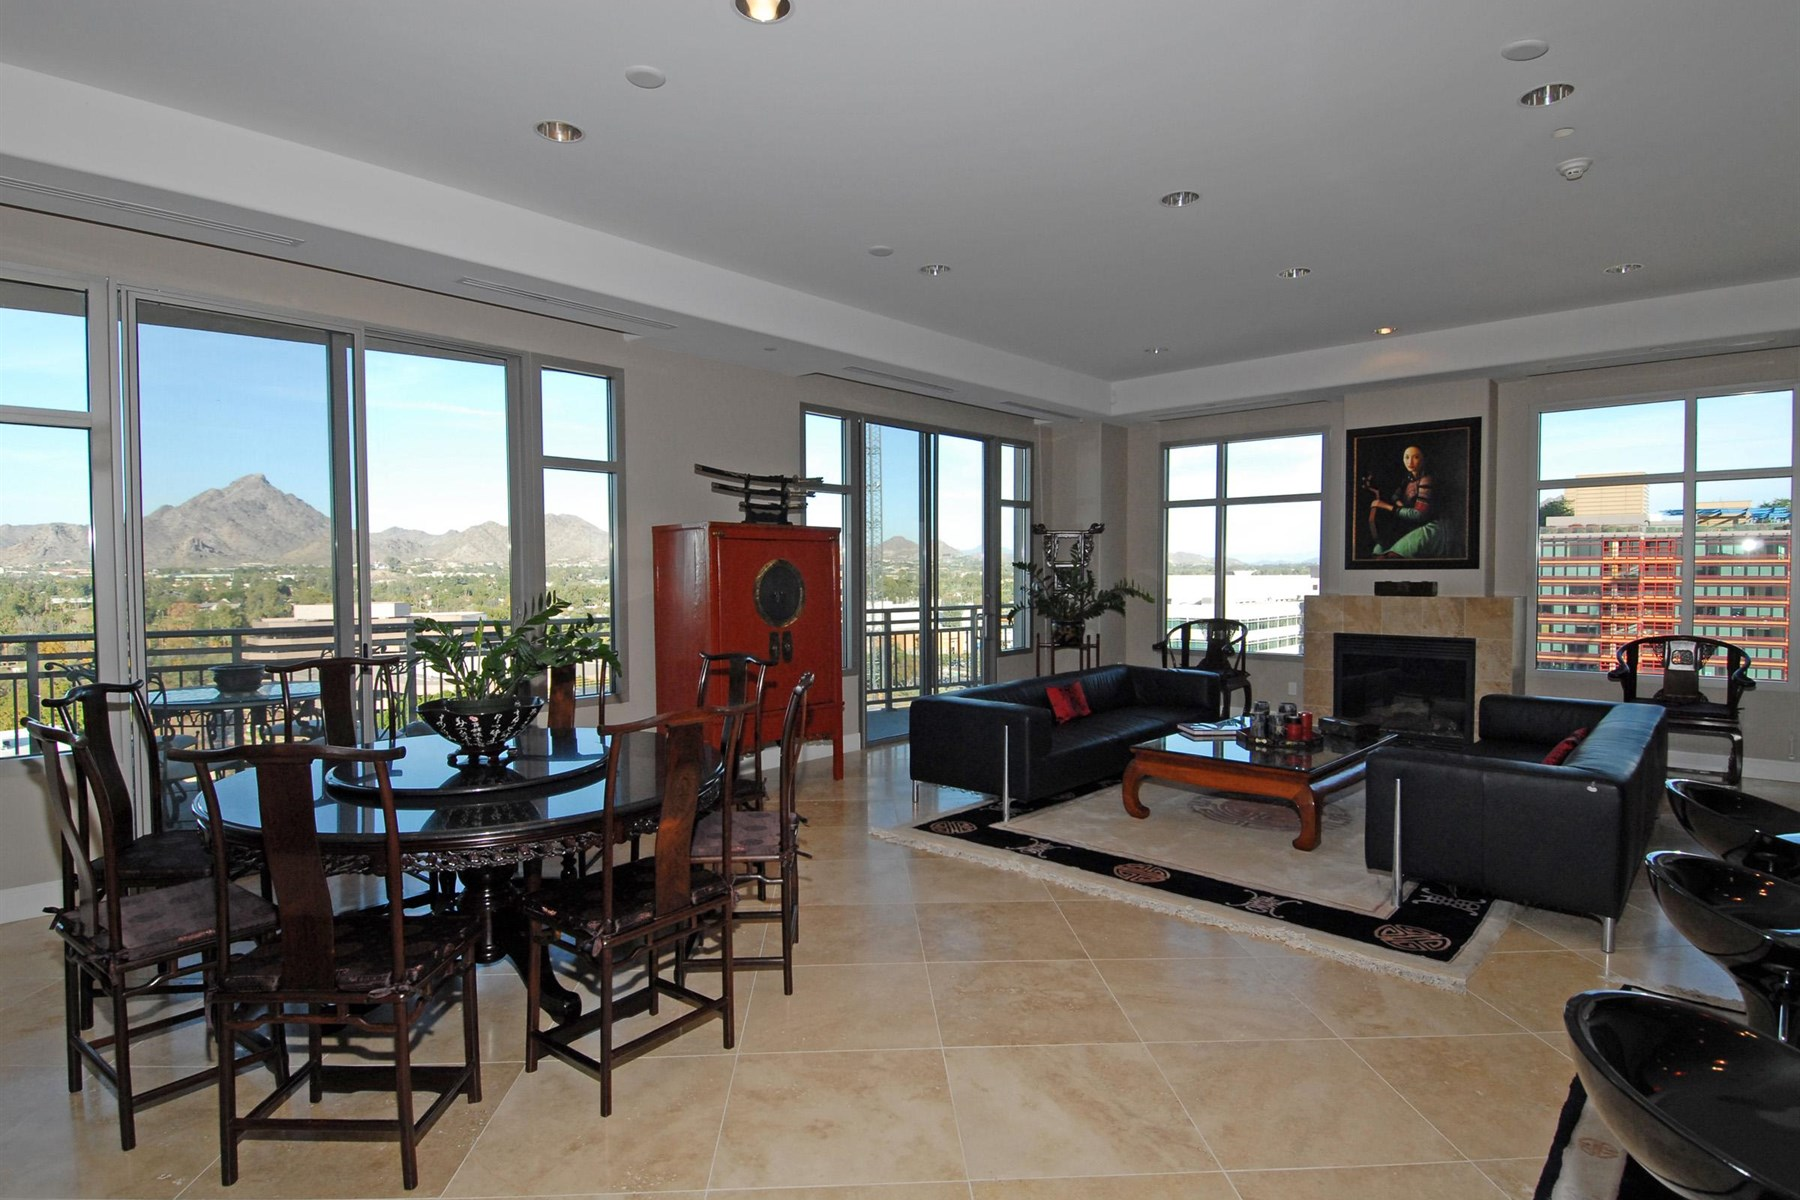 共管式独立产权公寓 为 销售 在 Curved Galleria Entry Foyer Opens To Glass Walls Of Urban City Views & Mtn Views 2211 E Camelback Rd #1202 Phoenix, 亚利桑那州 85016 美国